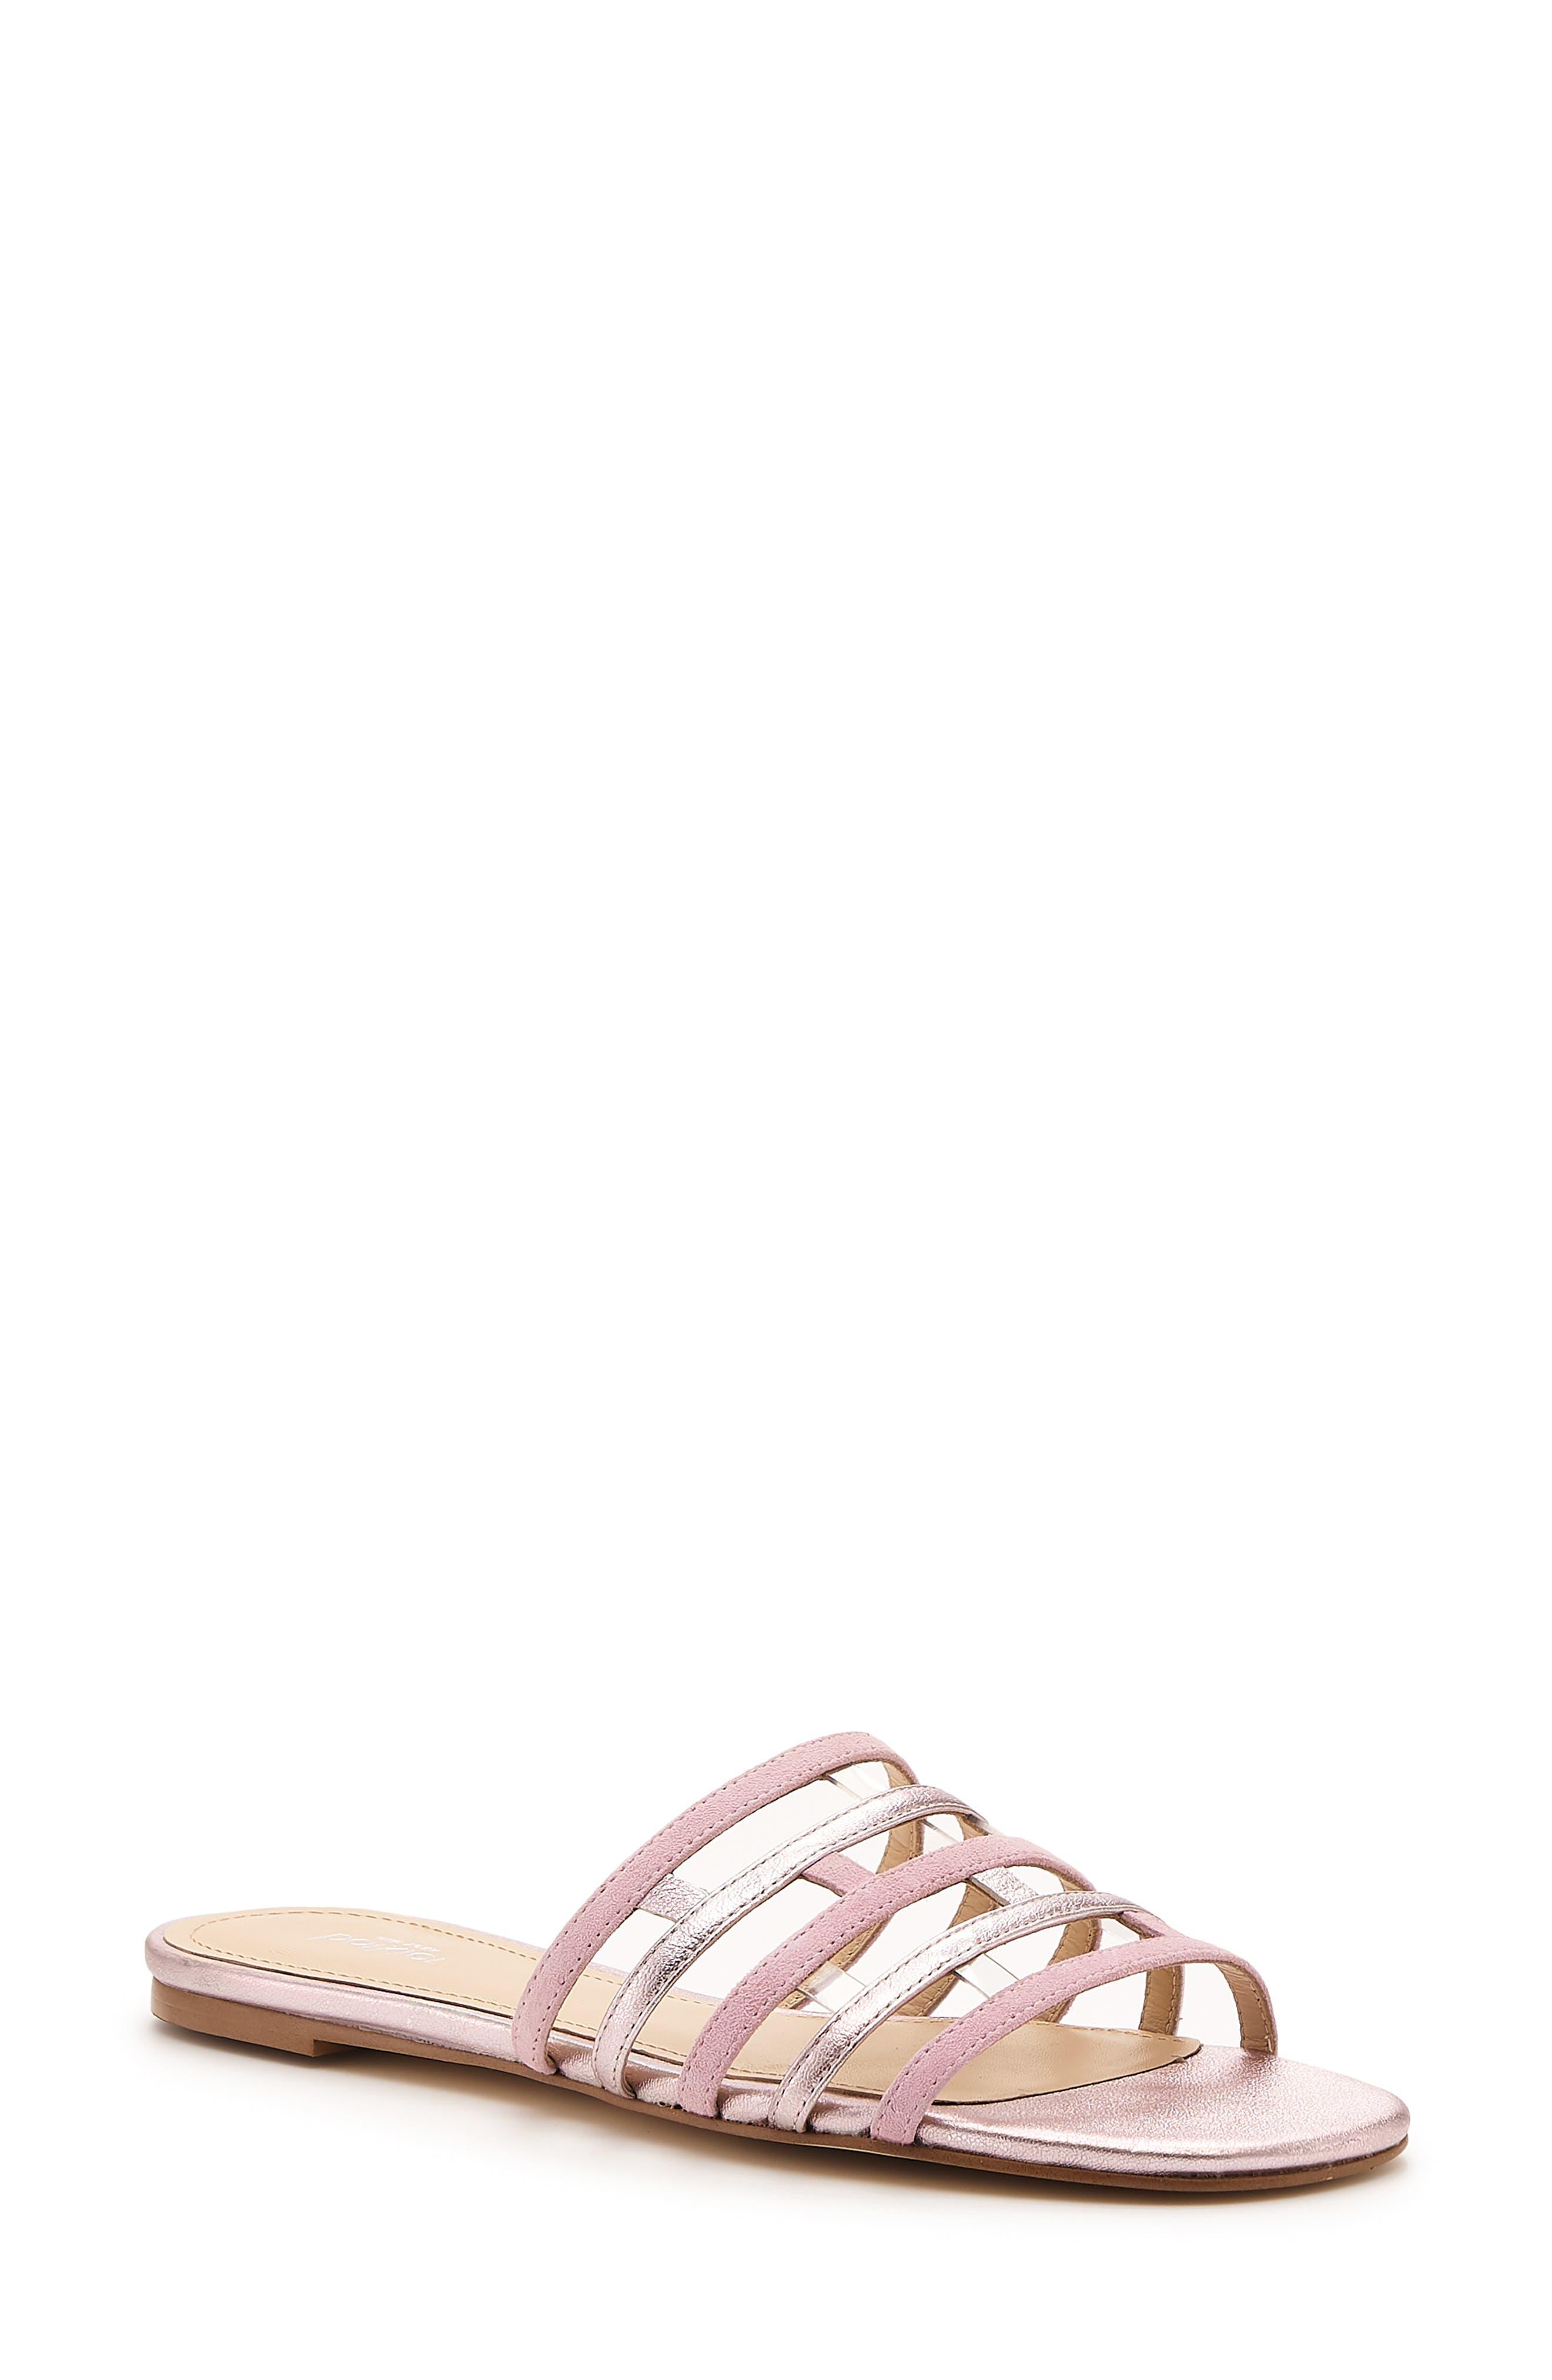 Brandy Strappy Slide Sandal